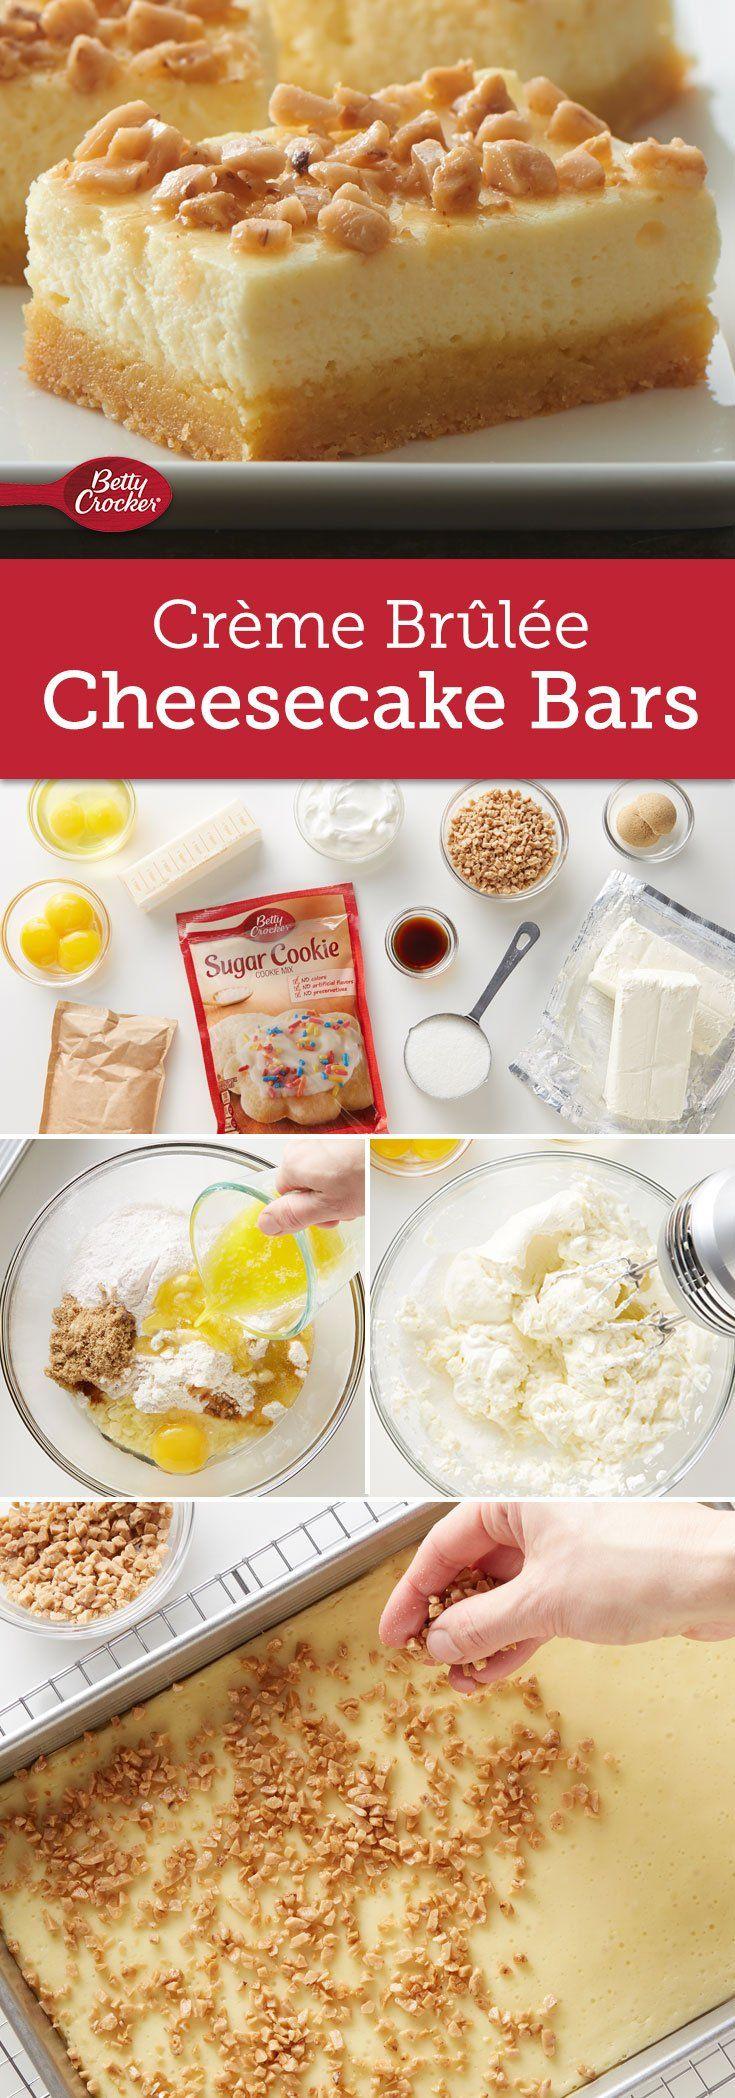 Savor the same great taste of restaurant Crème Brûlée in an easy-to-make bar cookie.